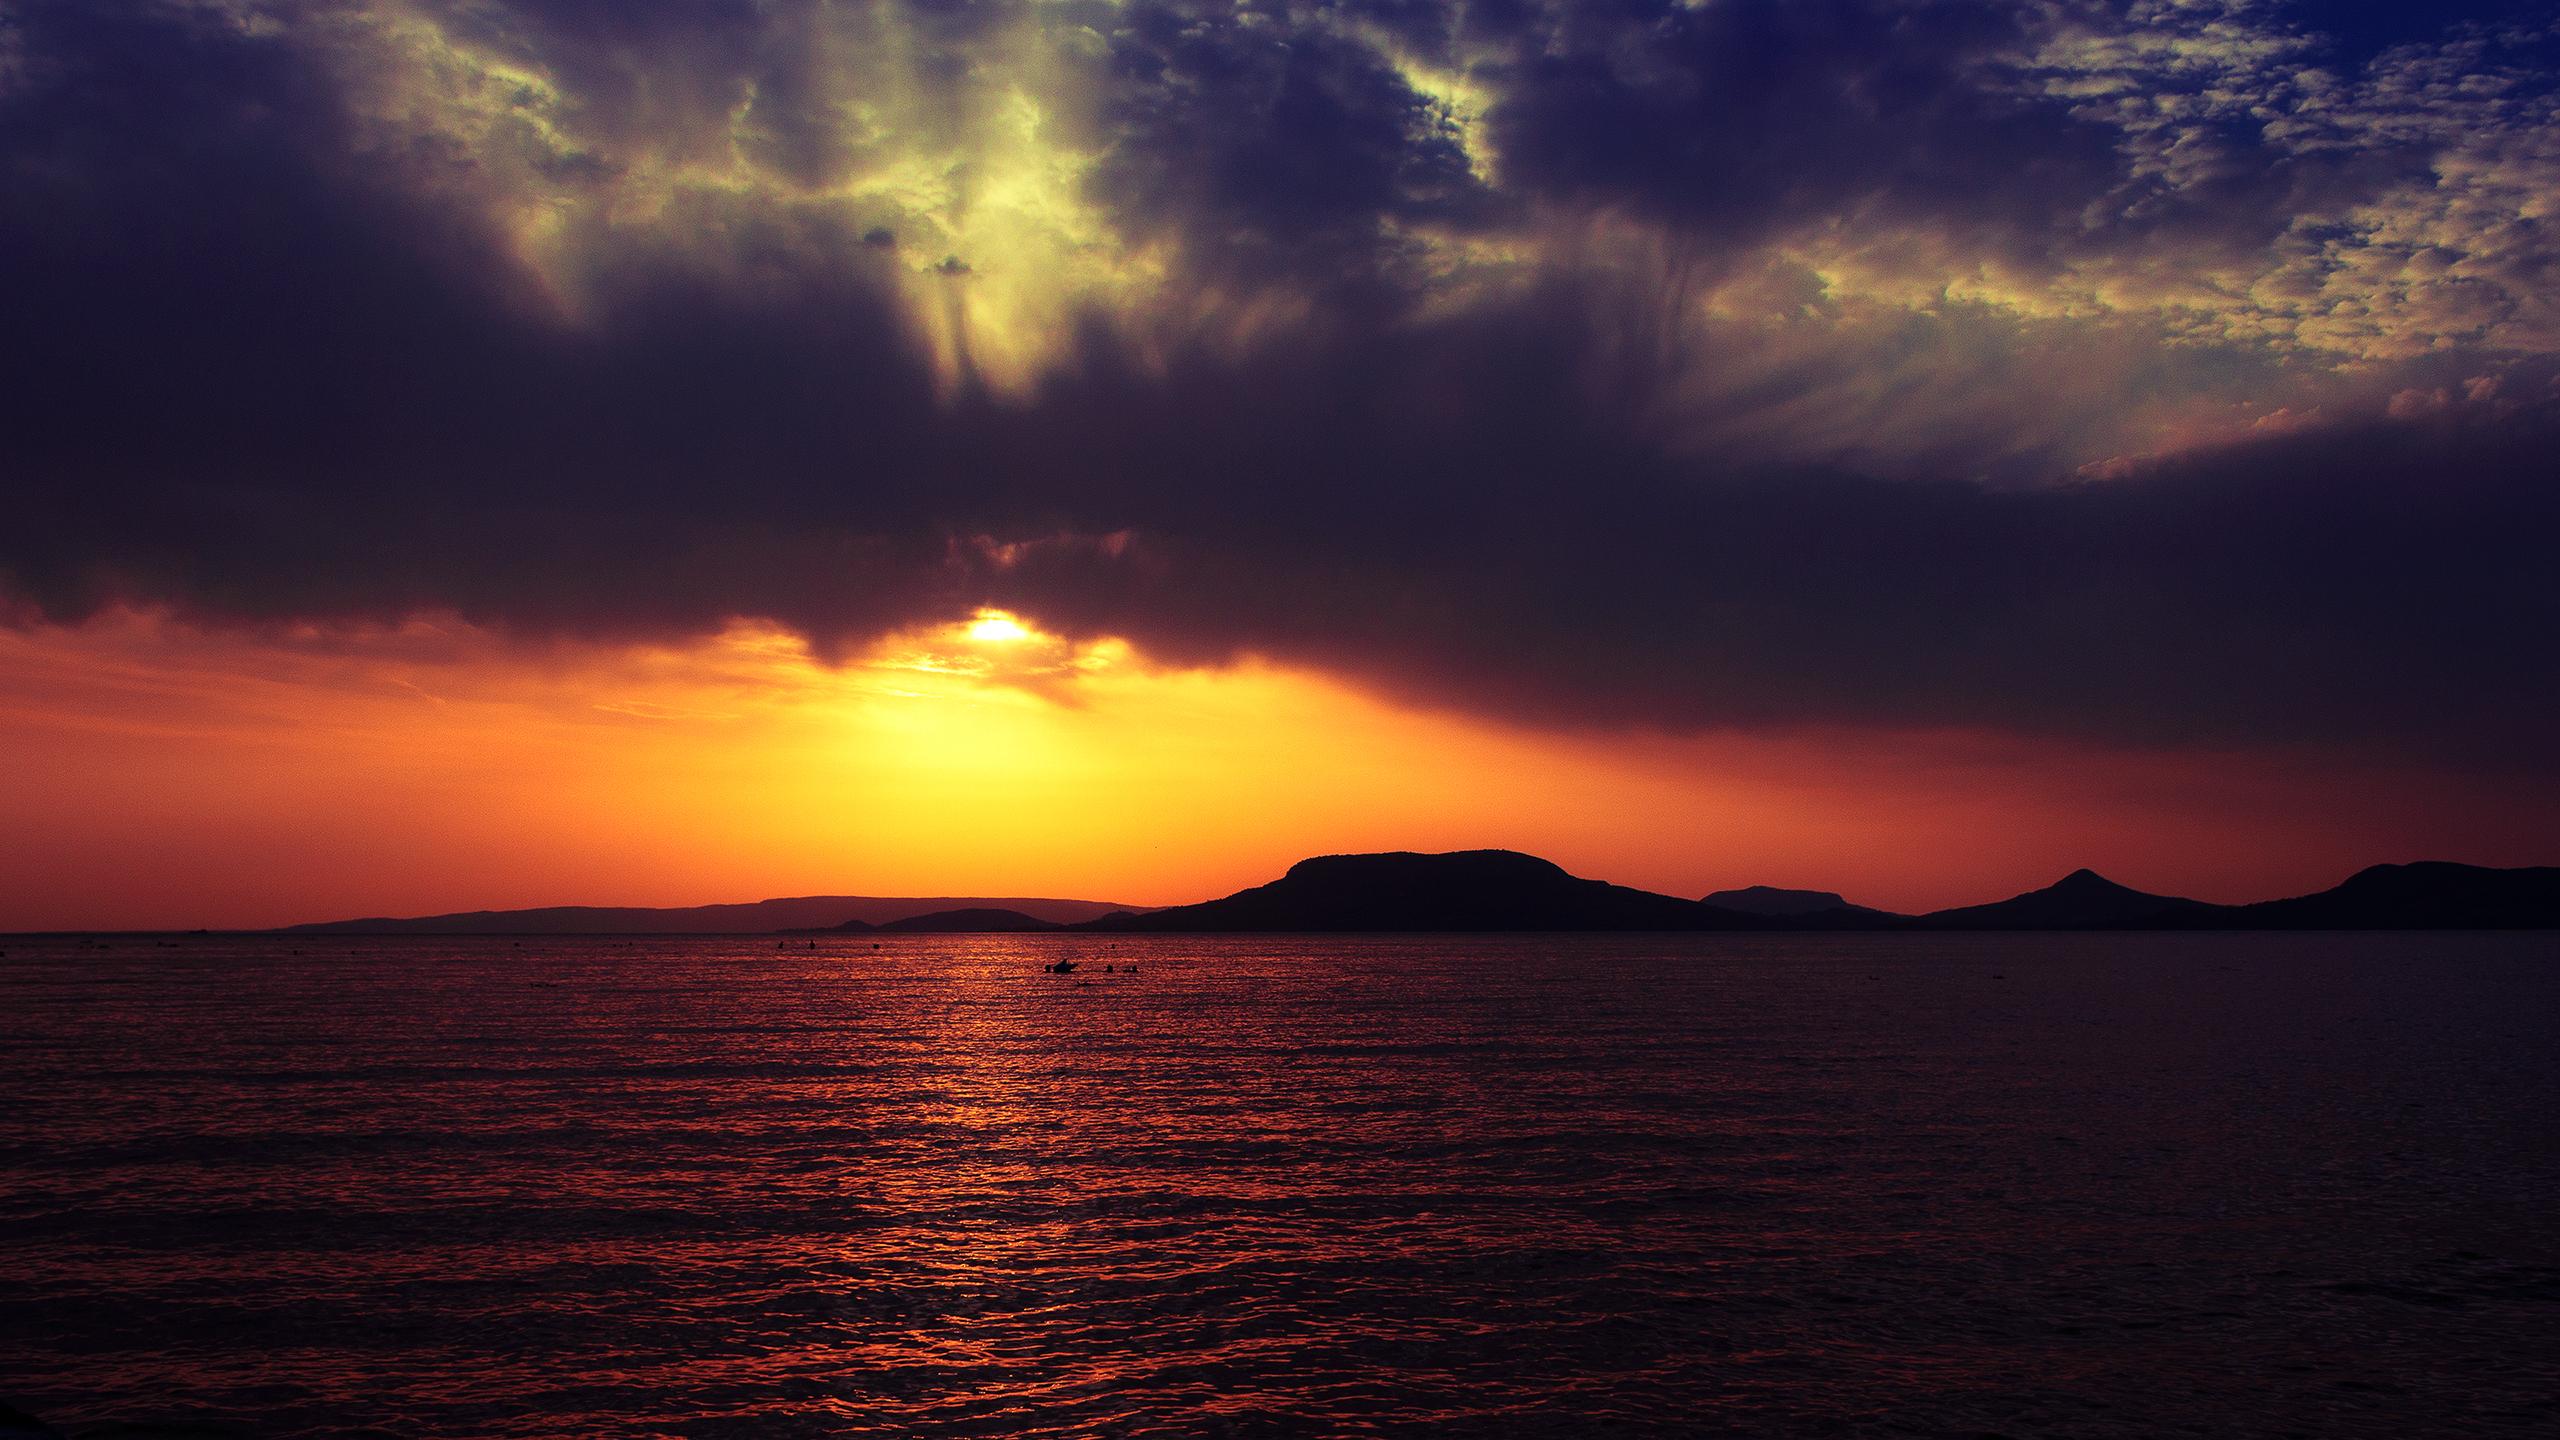 hungary_sunset_wallpaper_2560x1440